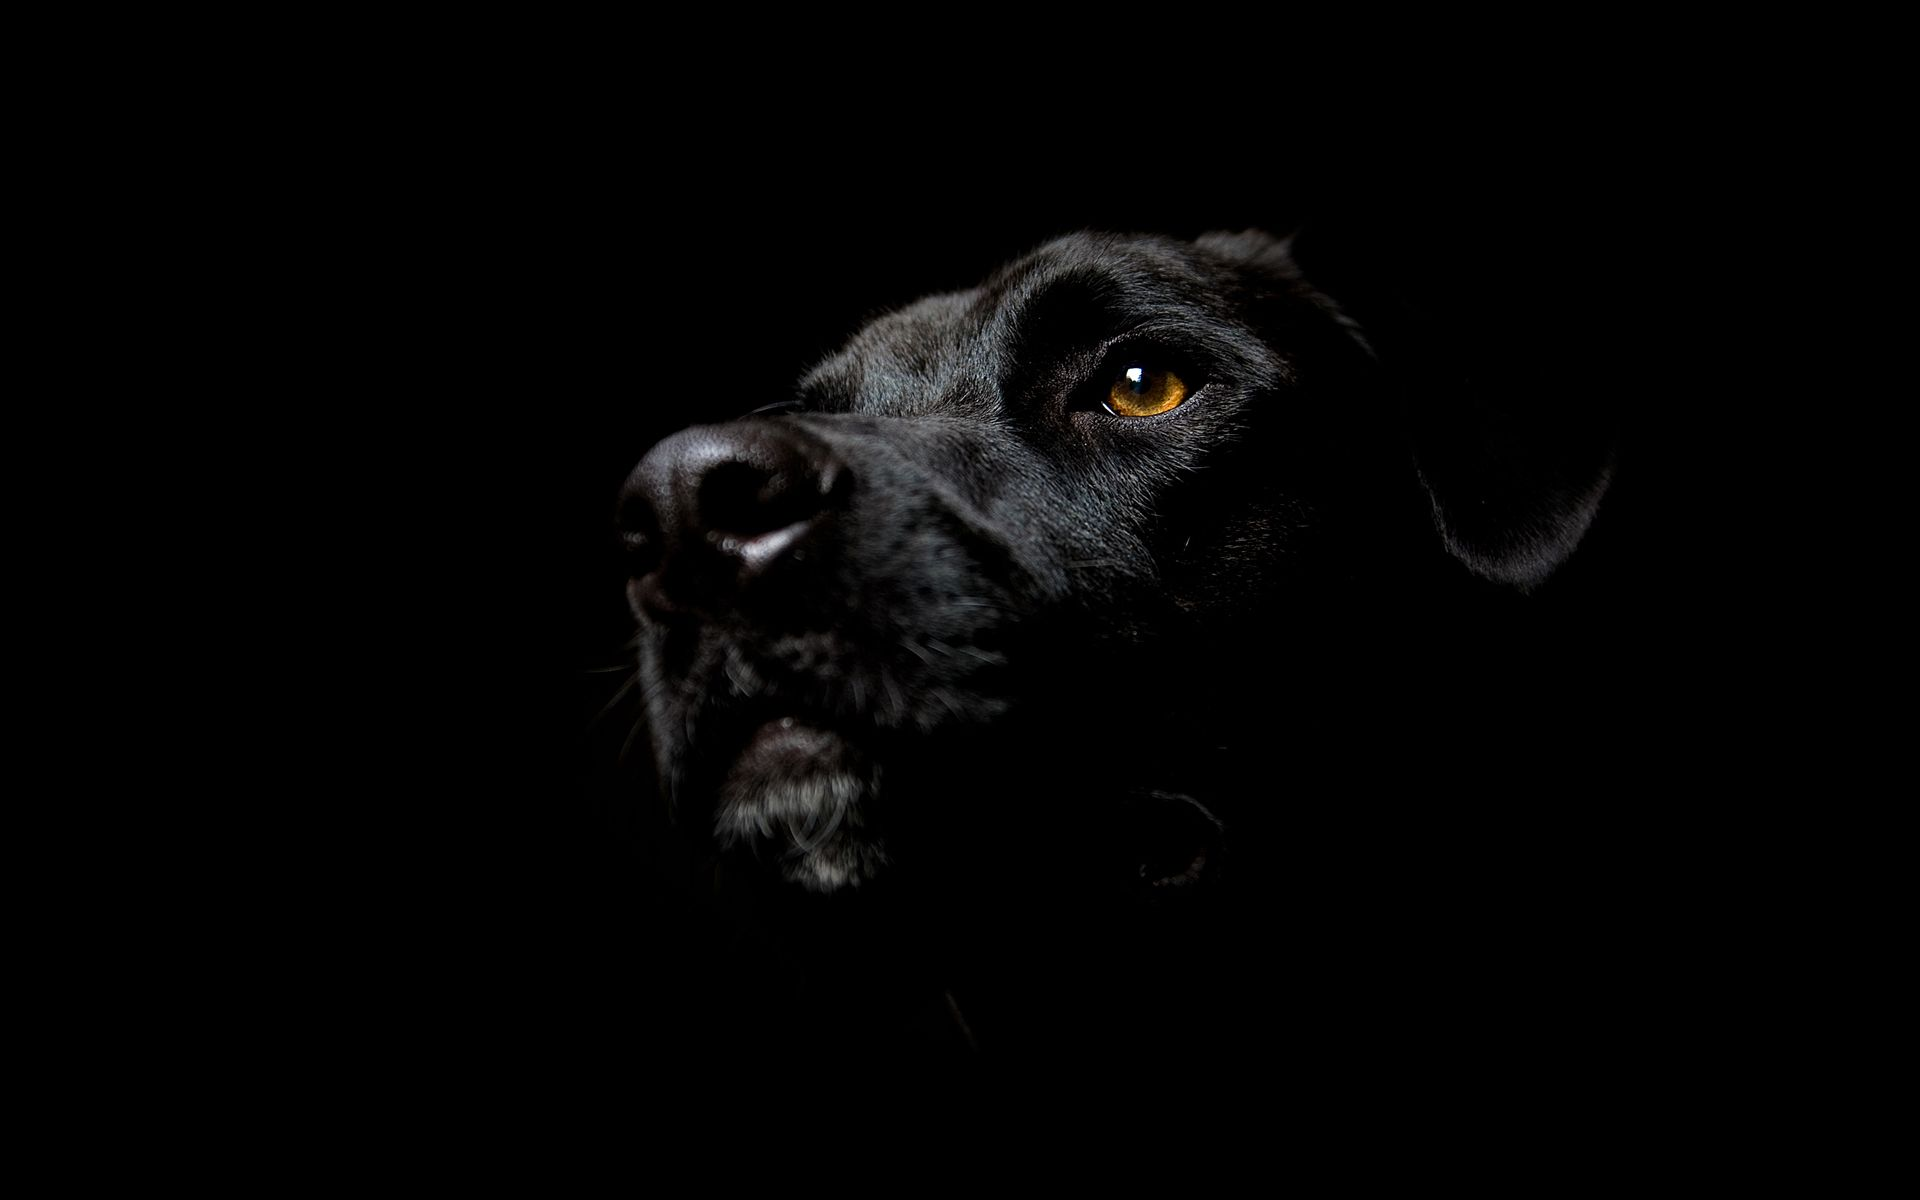 Hd animal wallpapers - Animal black background wallpaper ...